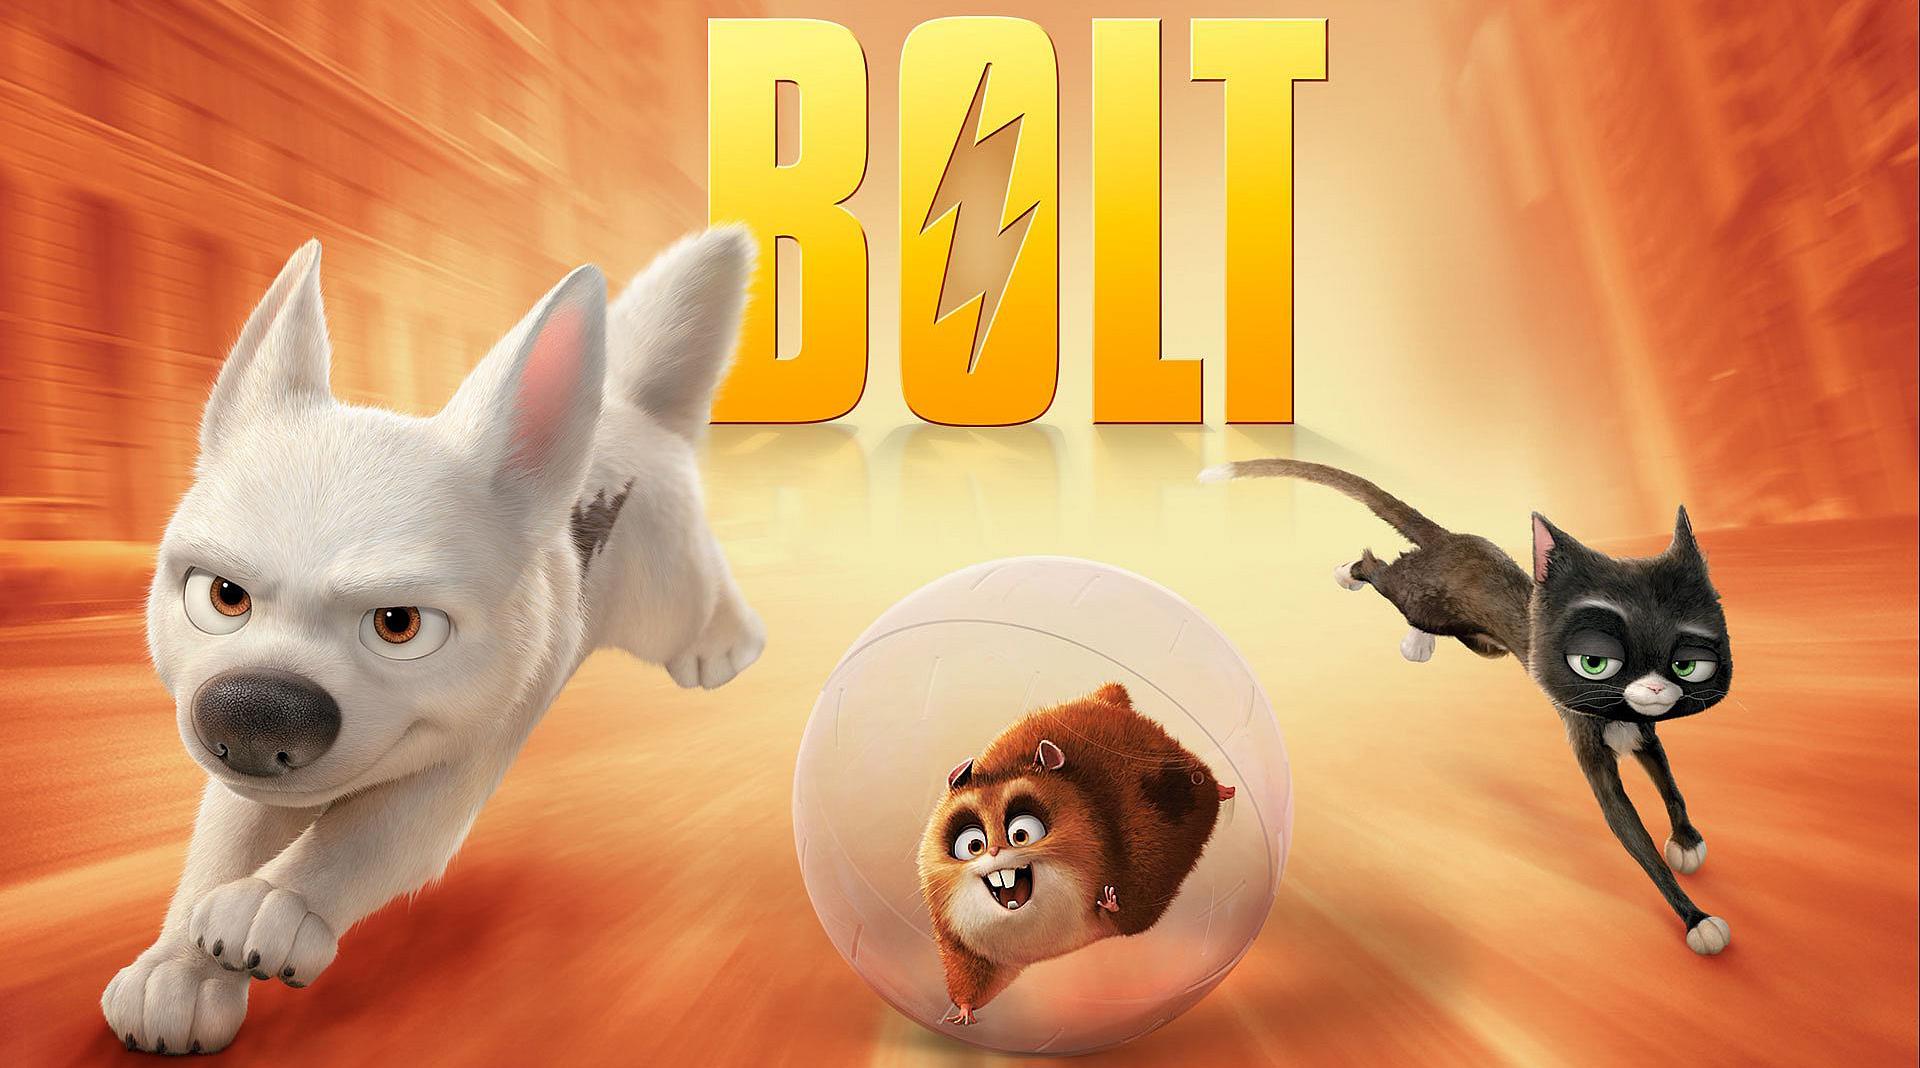 Walt Disney Animation Studios— Bolt